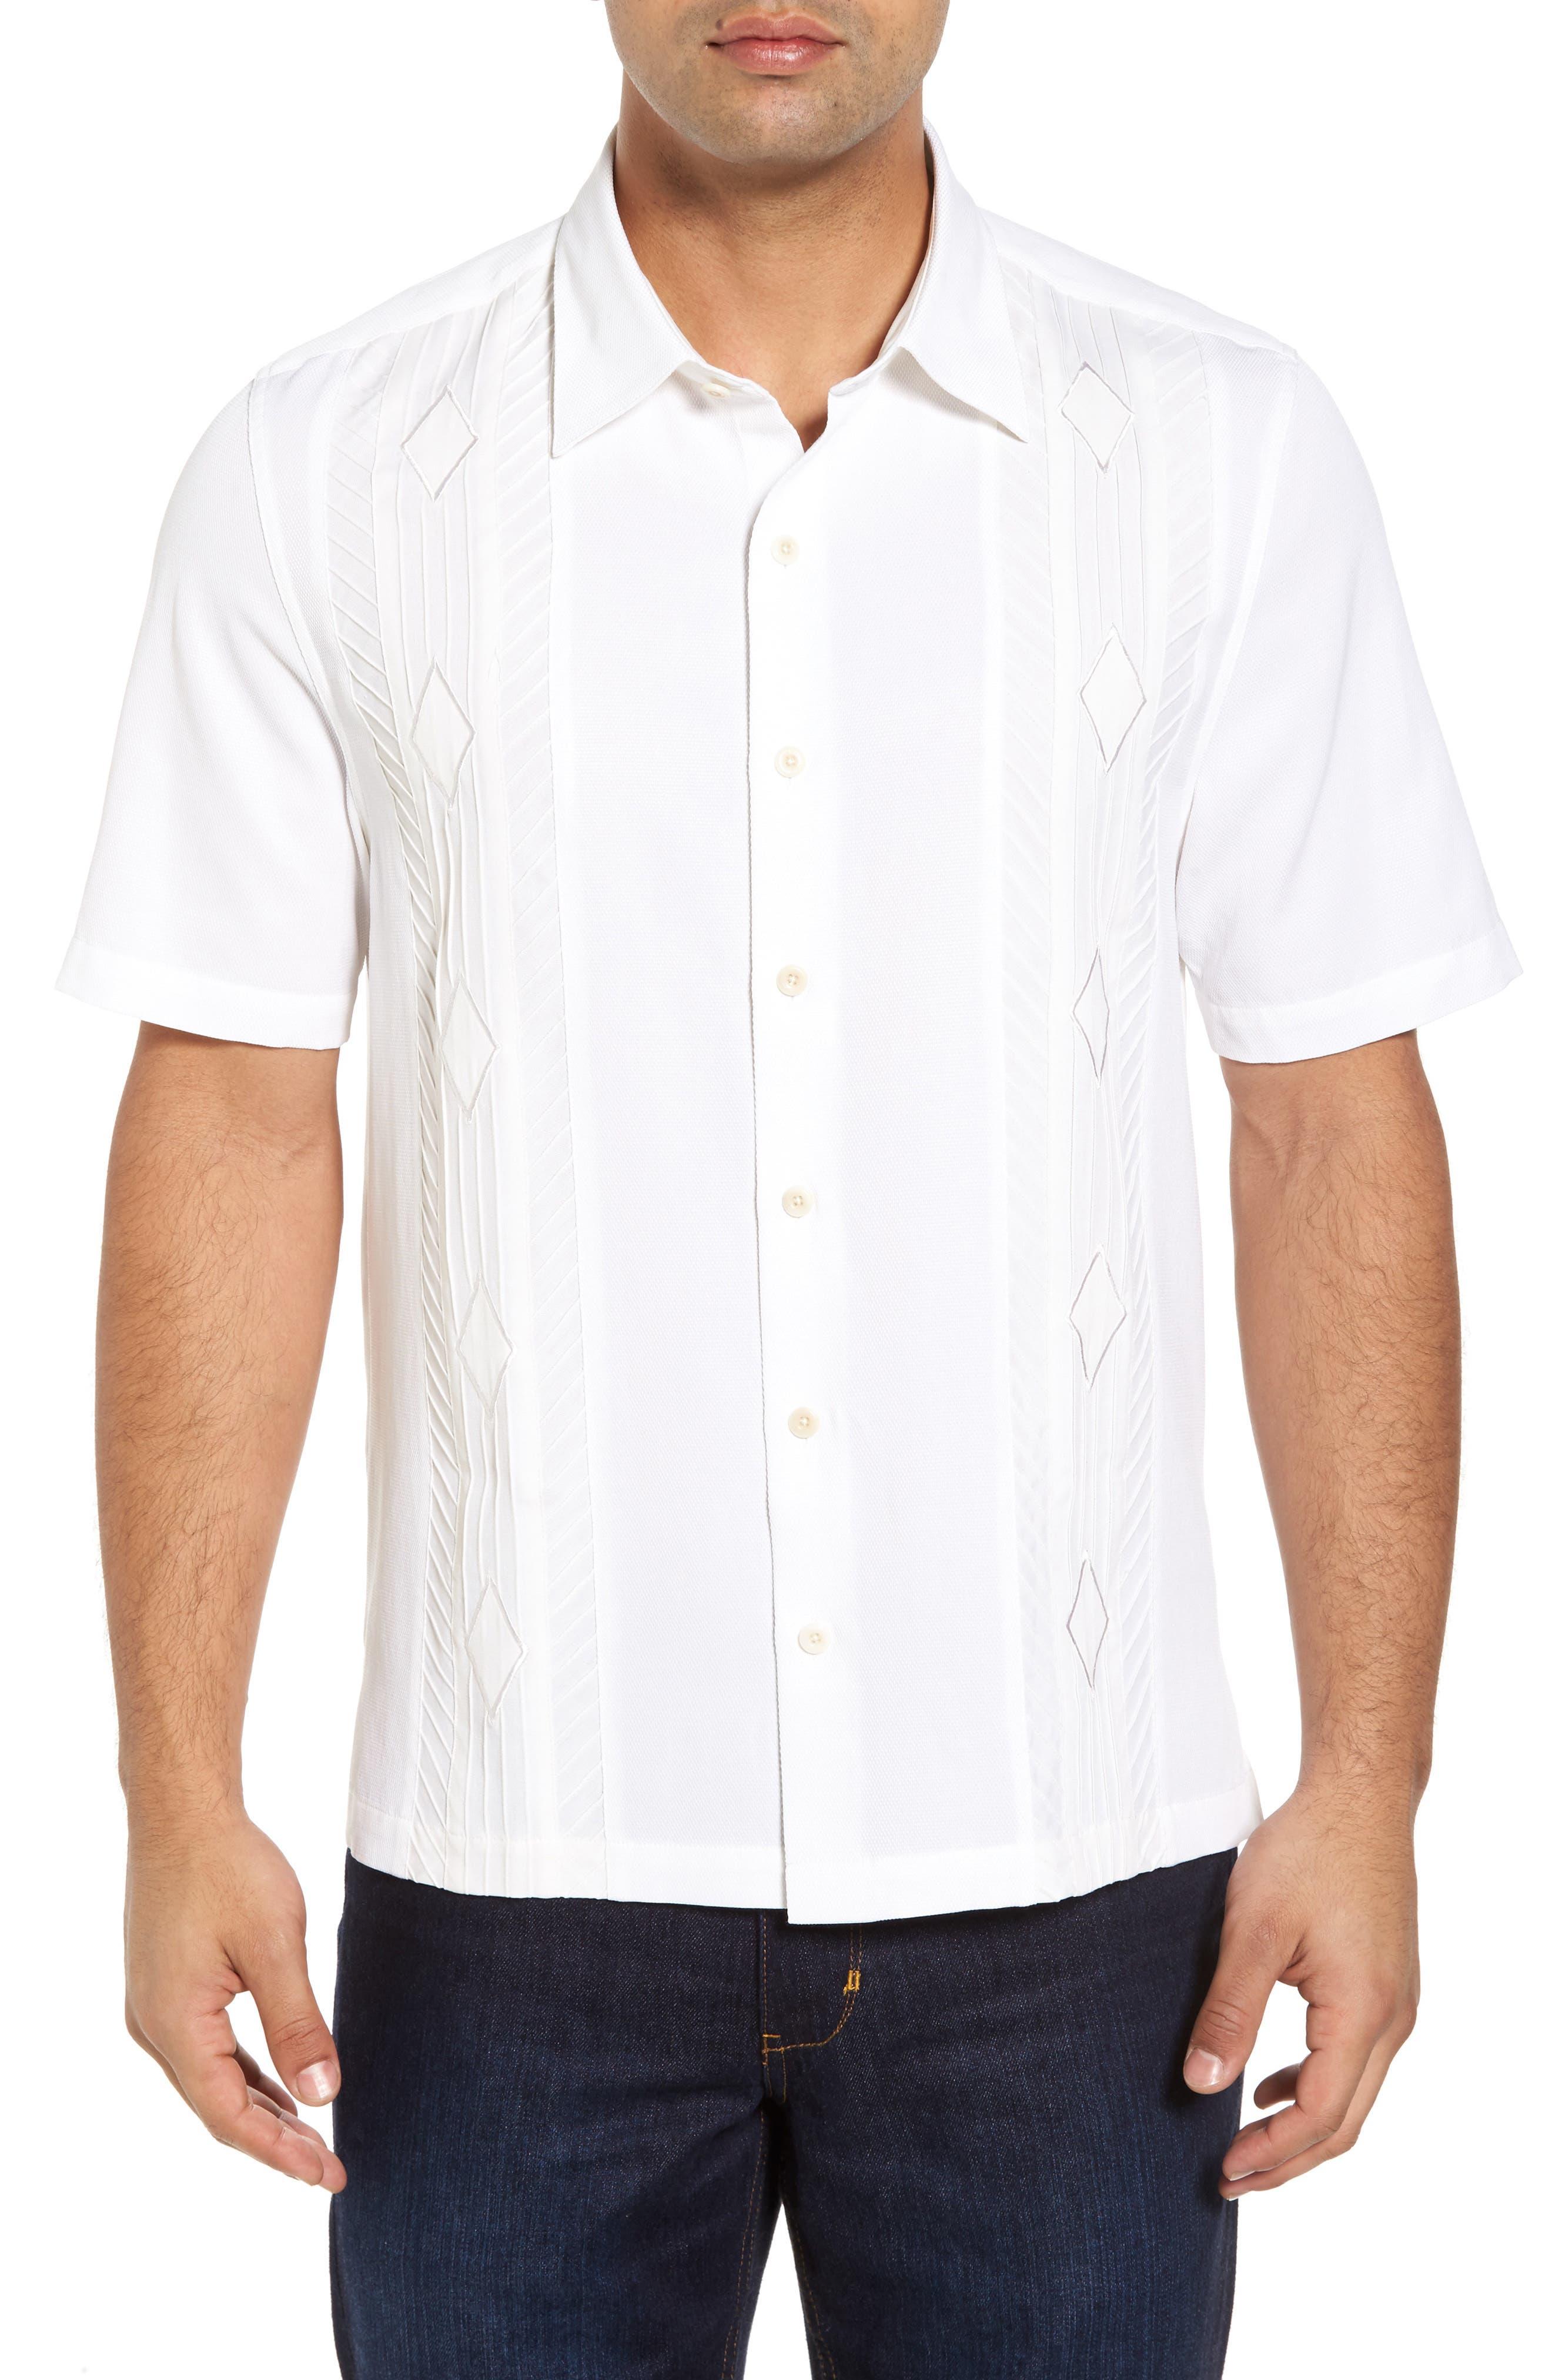 Main Image - Nat Nast Gondola Embroidered Jacquard Silk Blend Sport Shirt